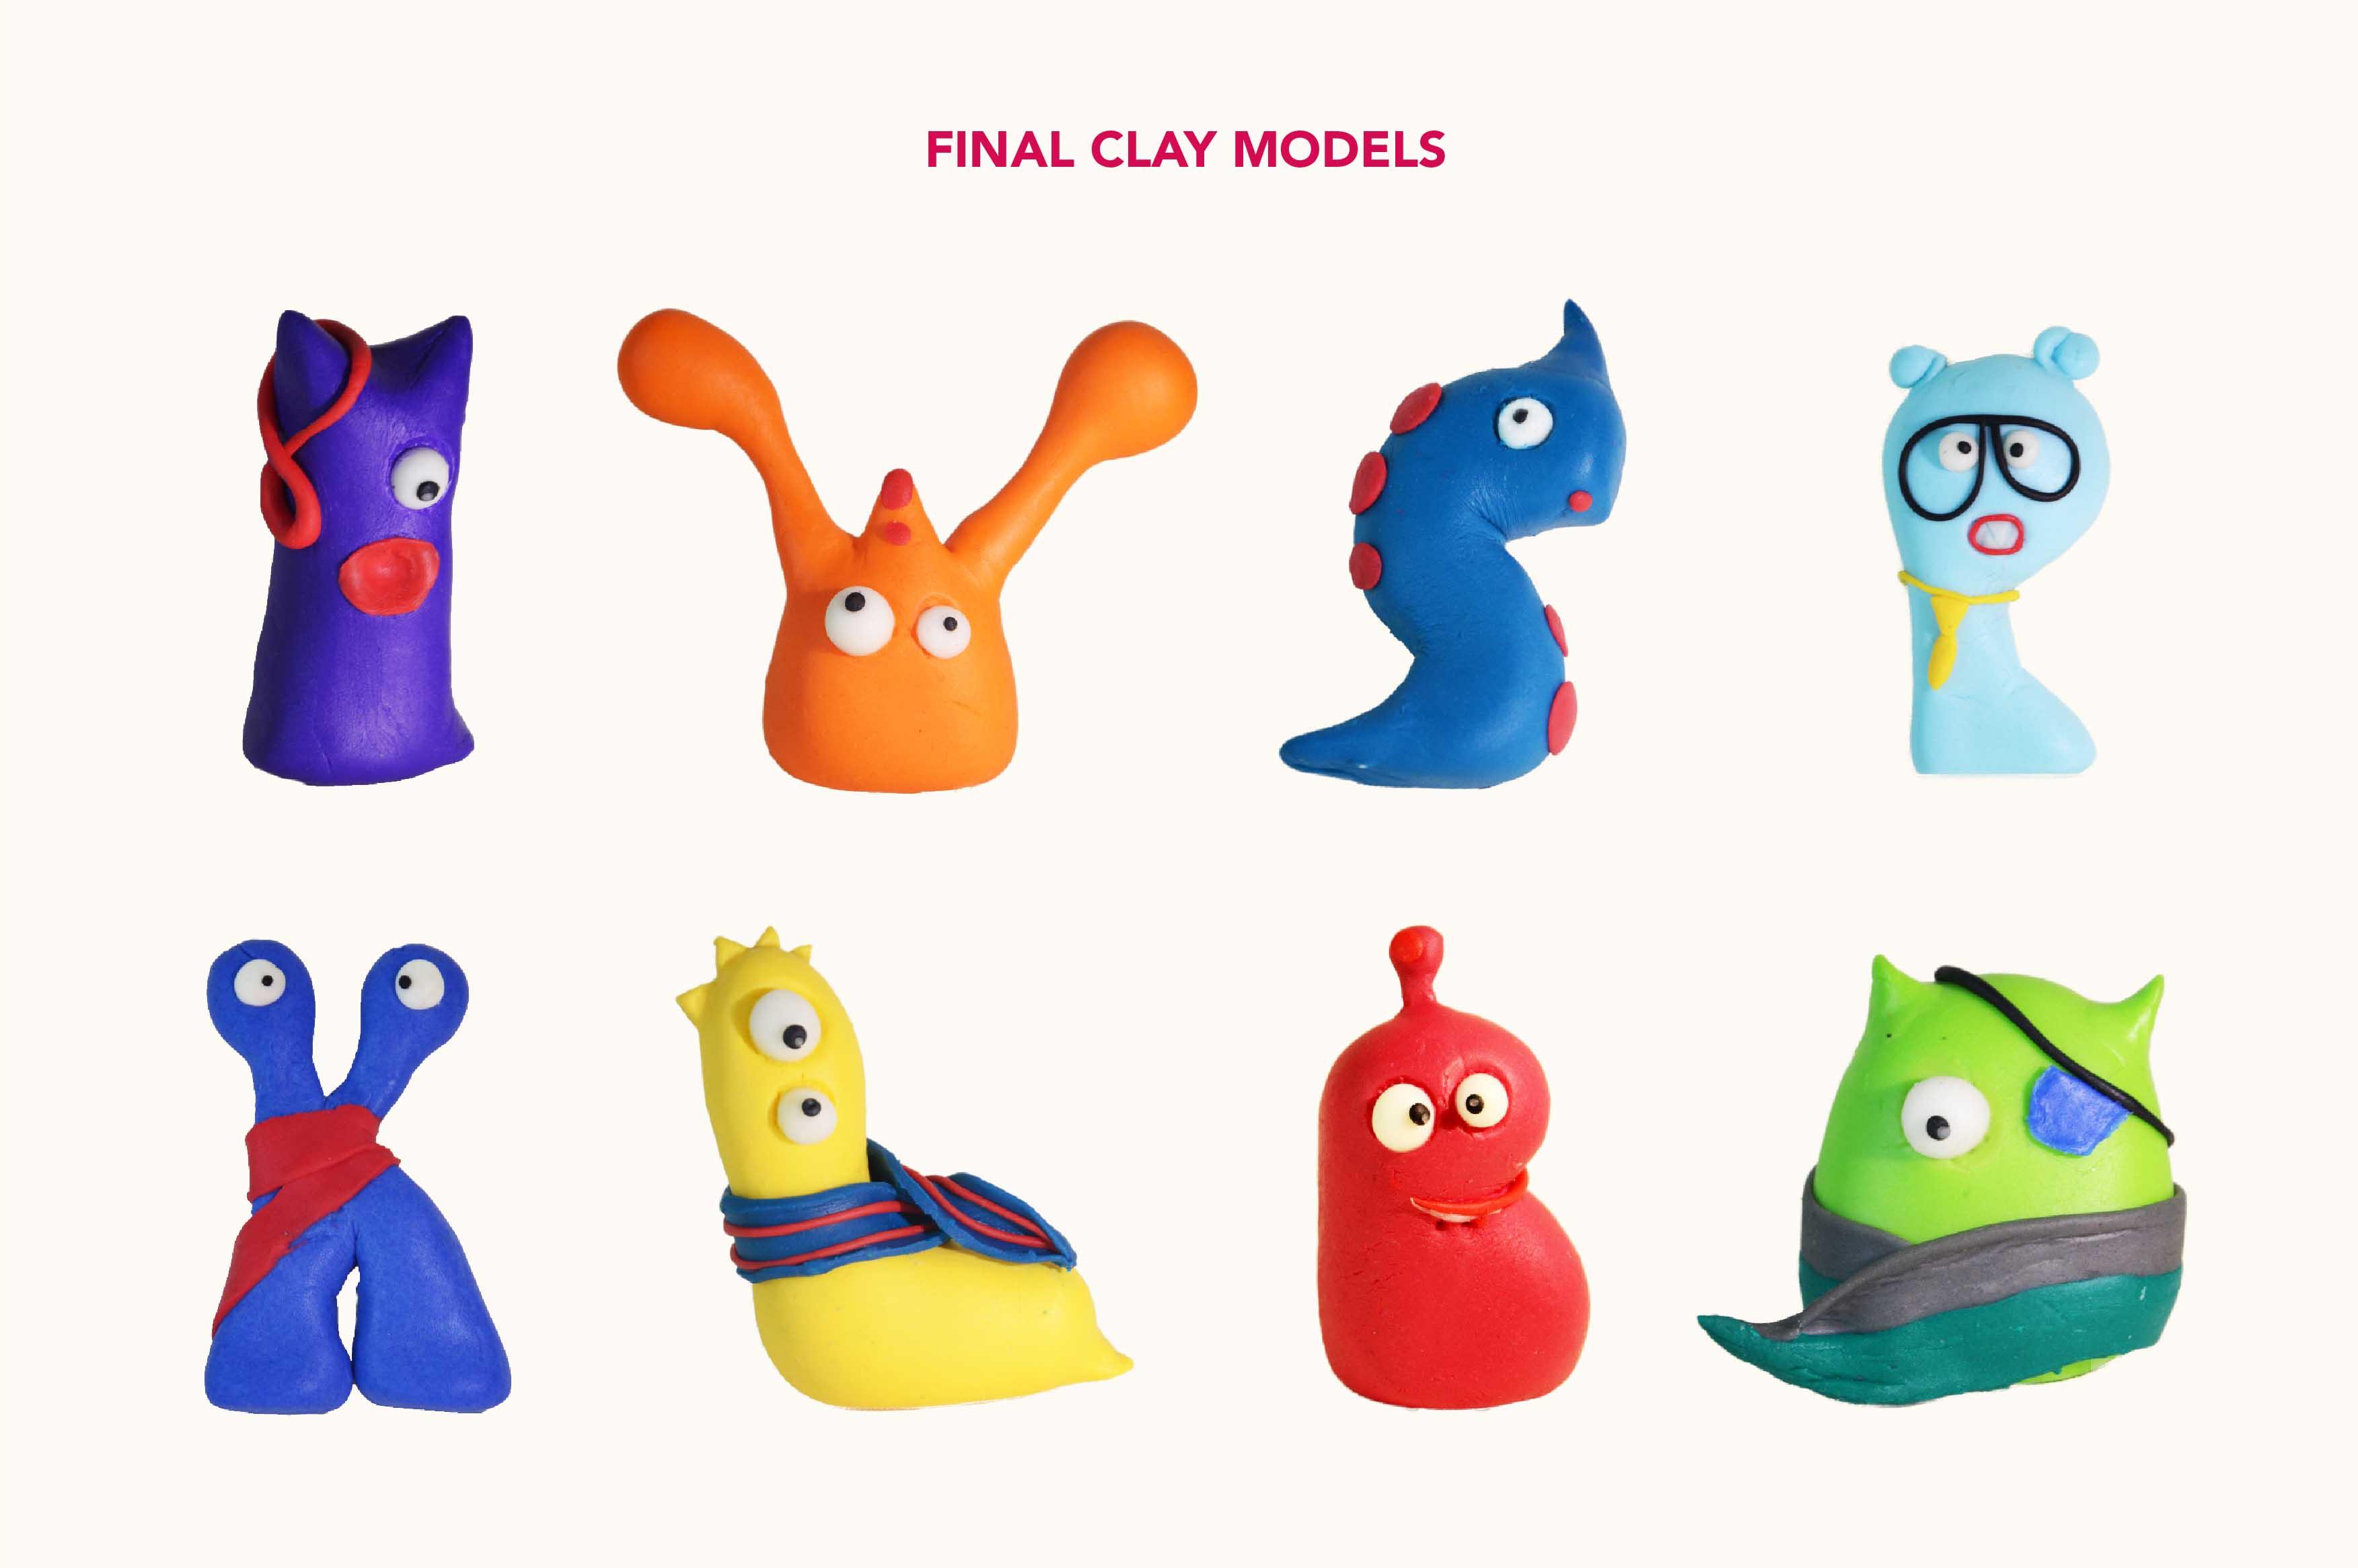 Final Clay Models